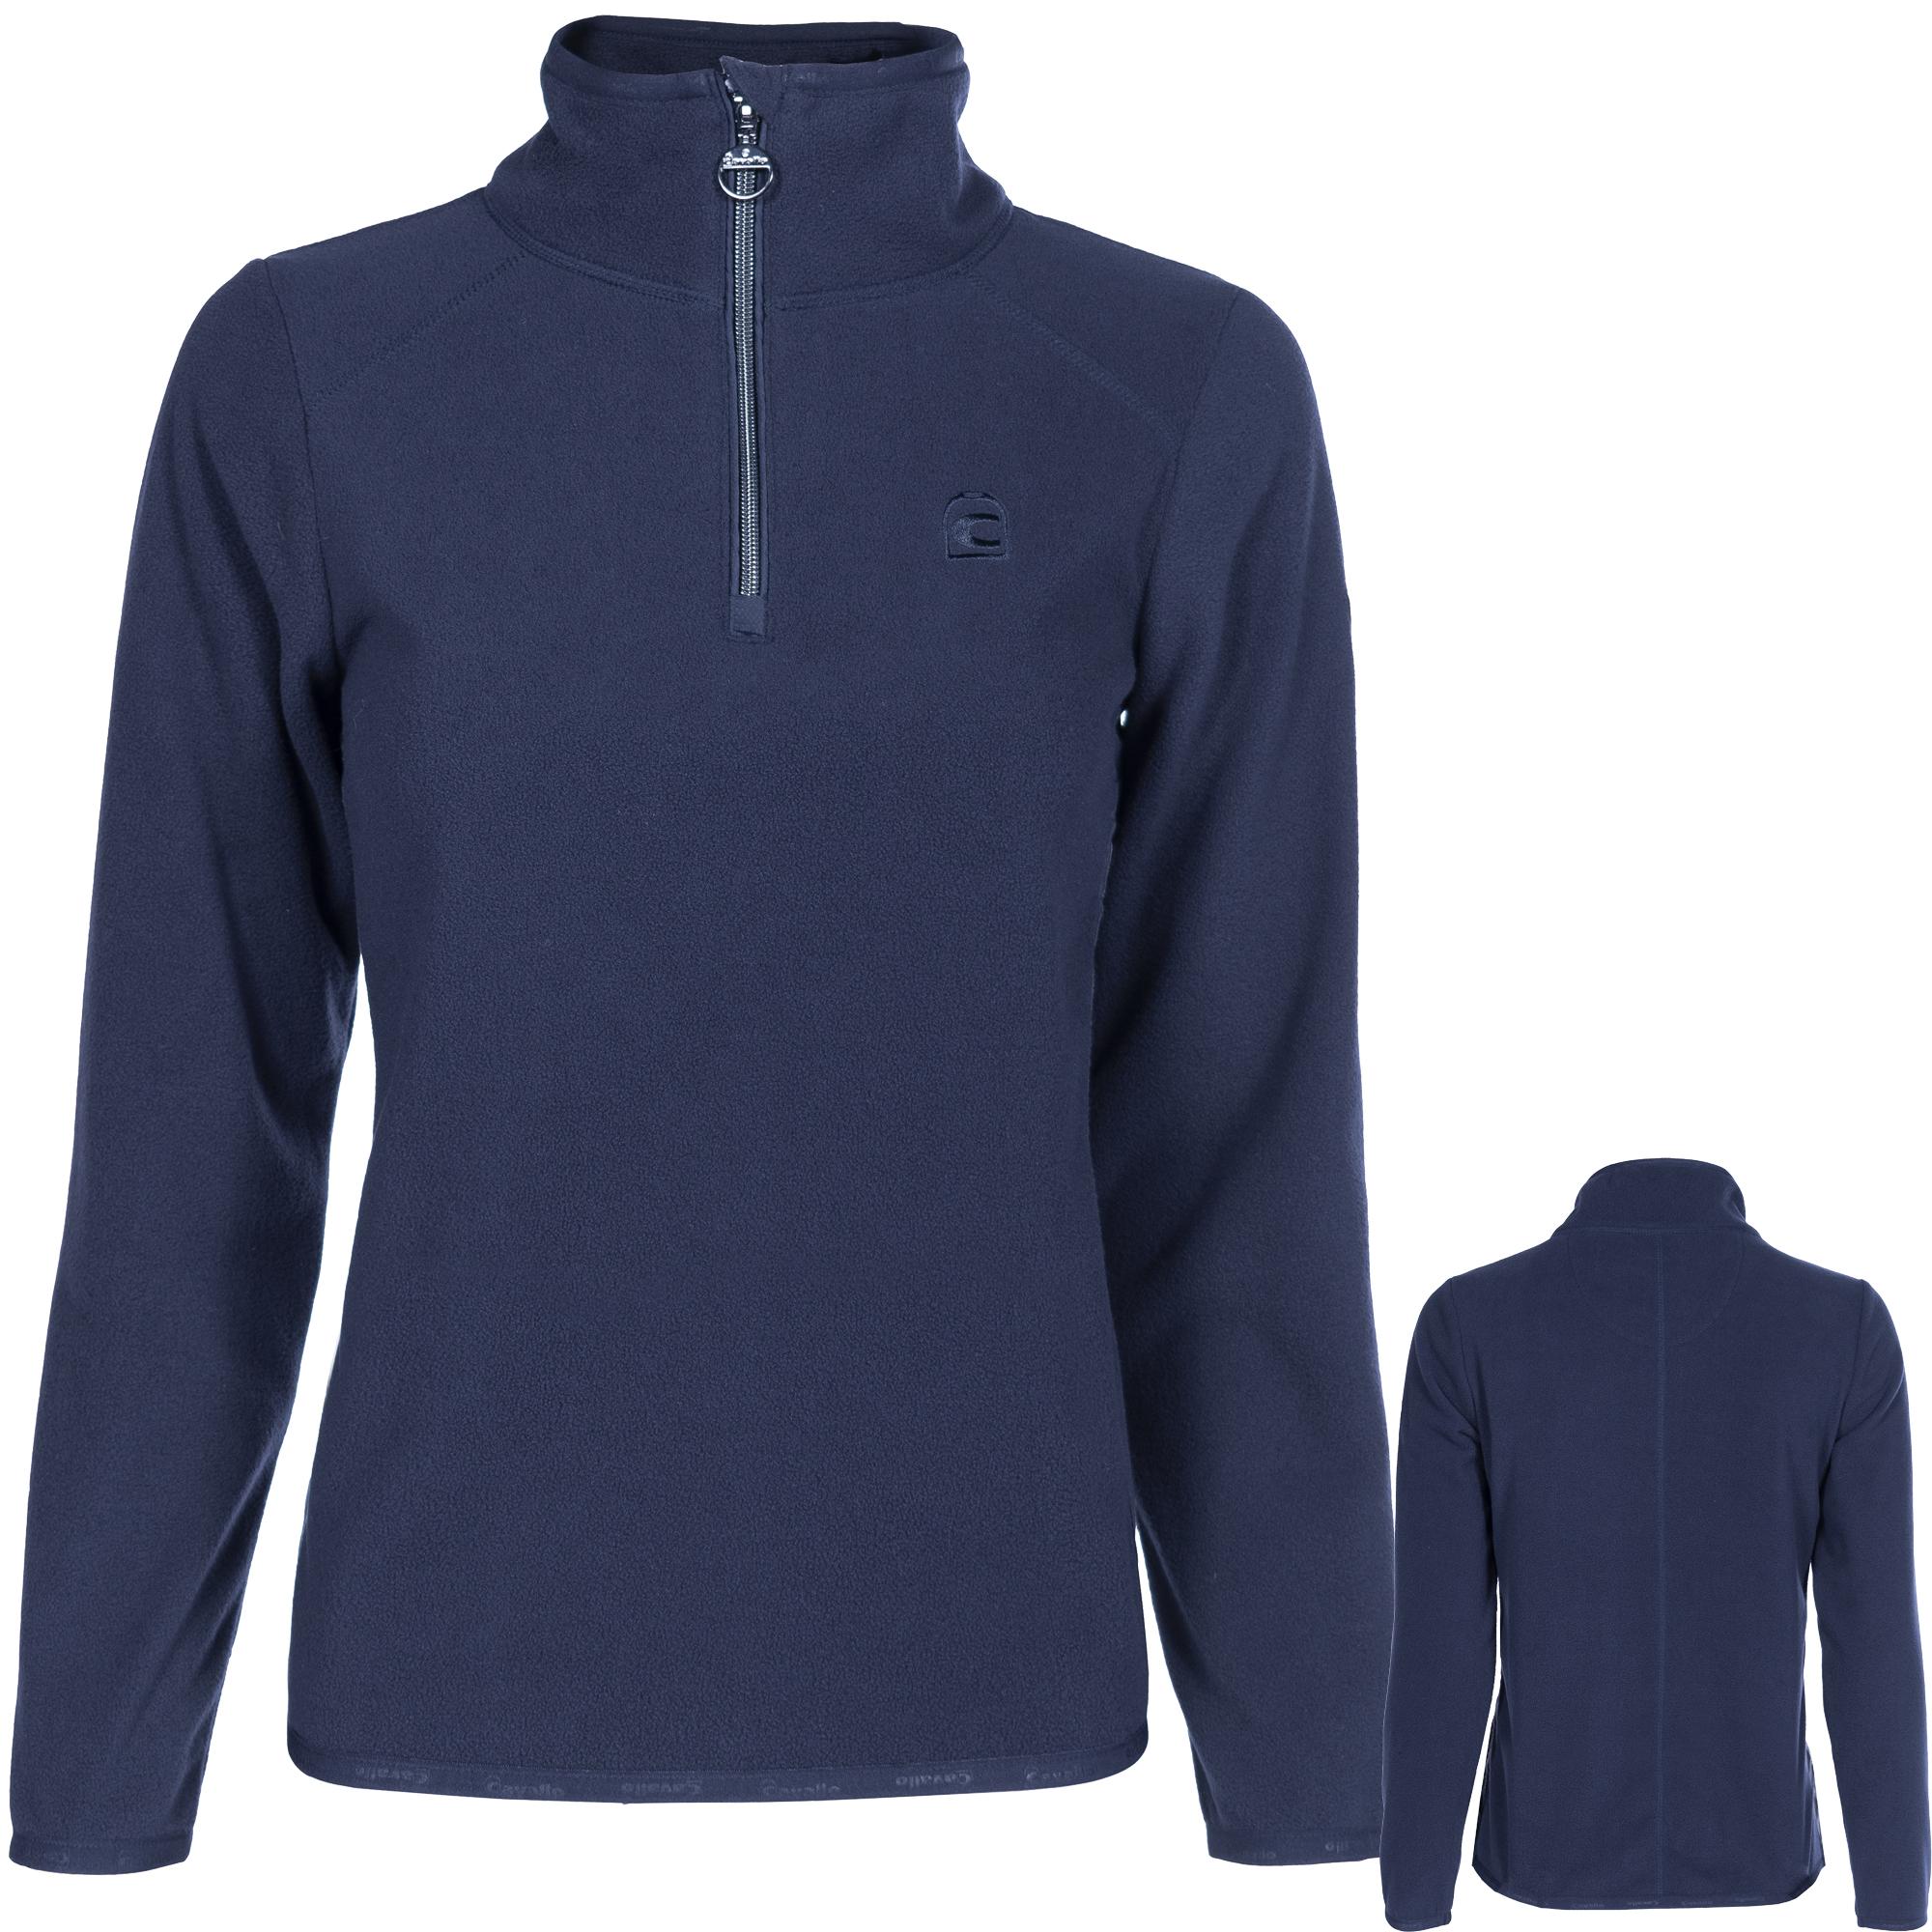 Cavallo Damen Fleece-Shirt Bela in darkblue